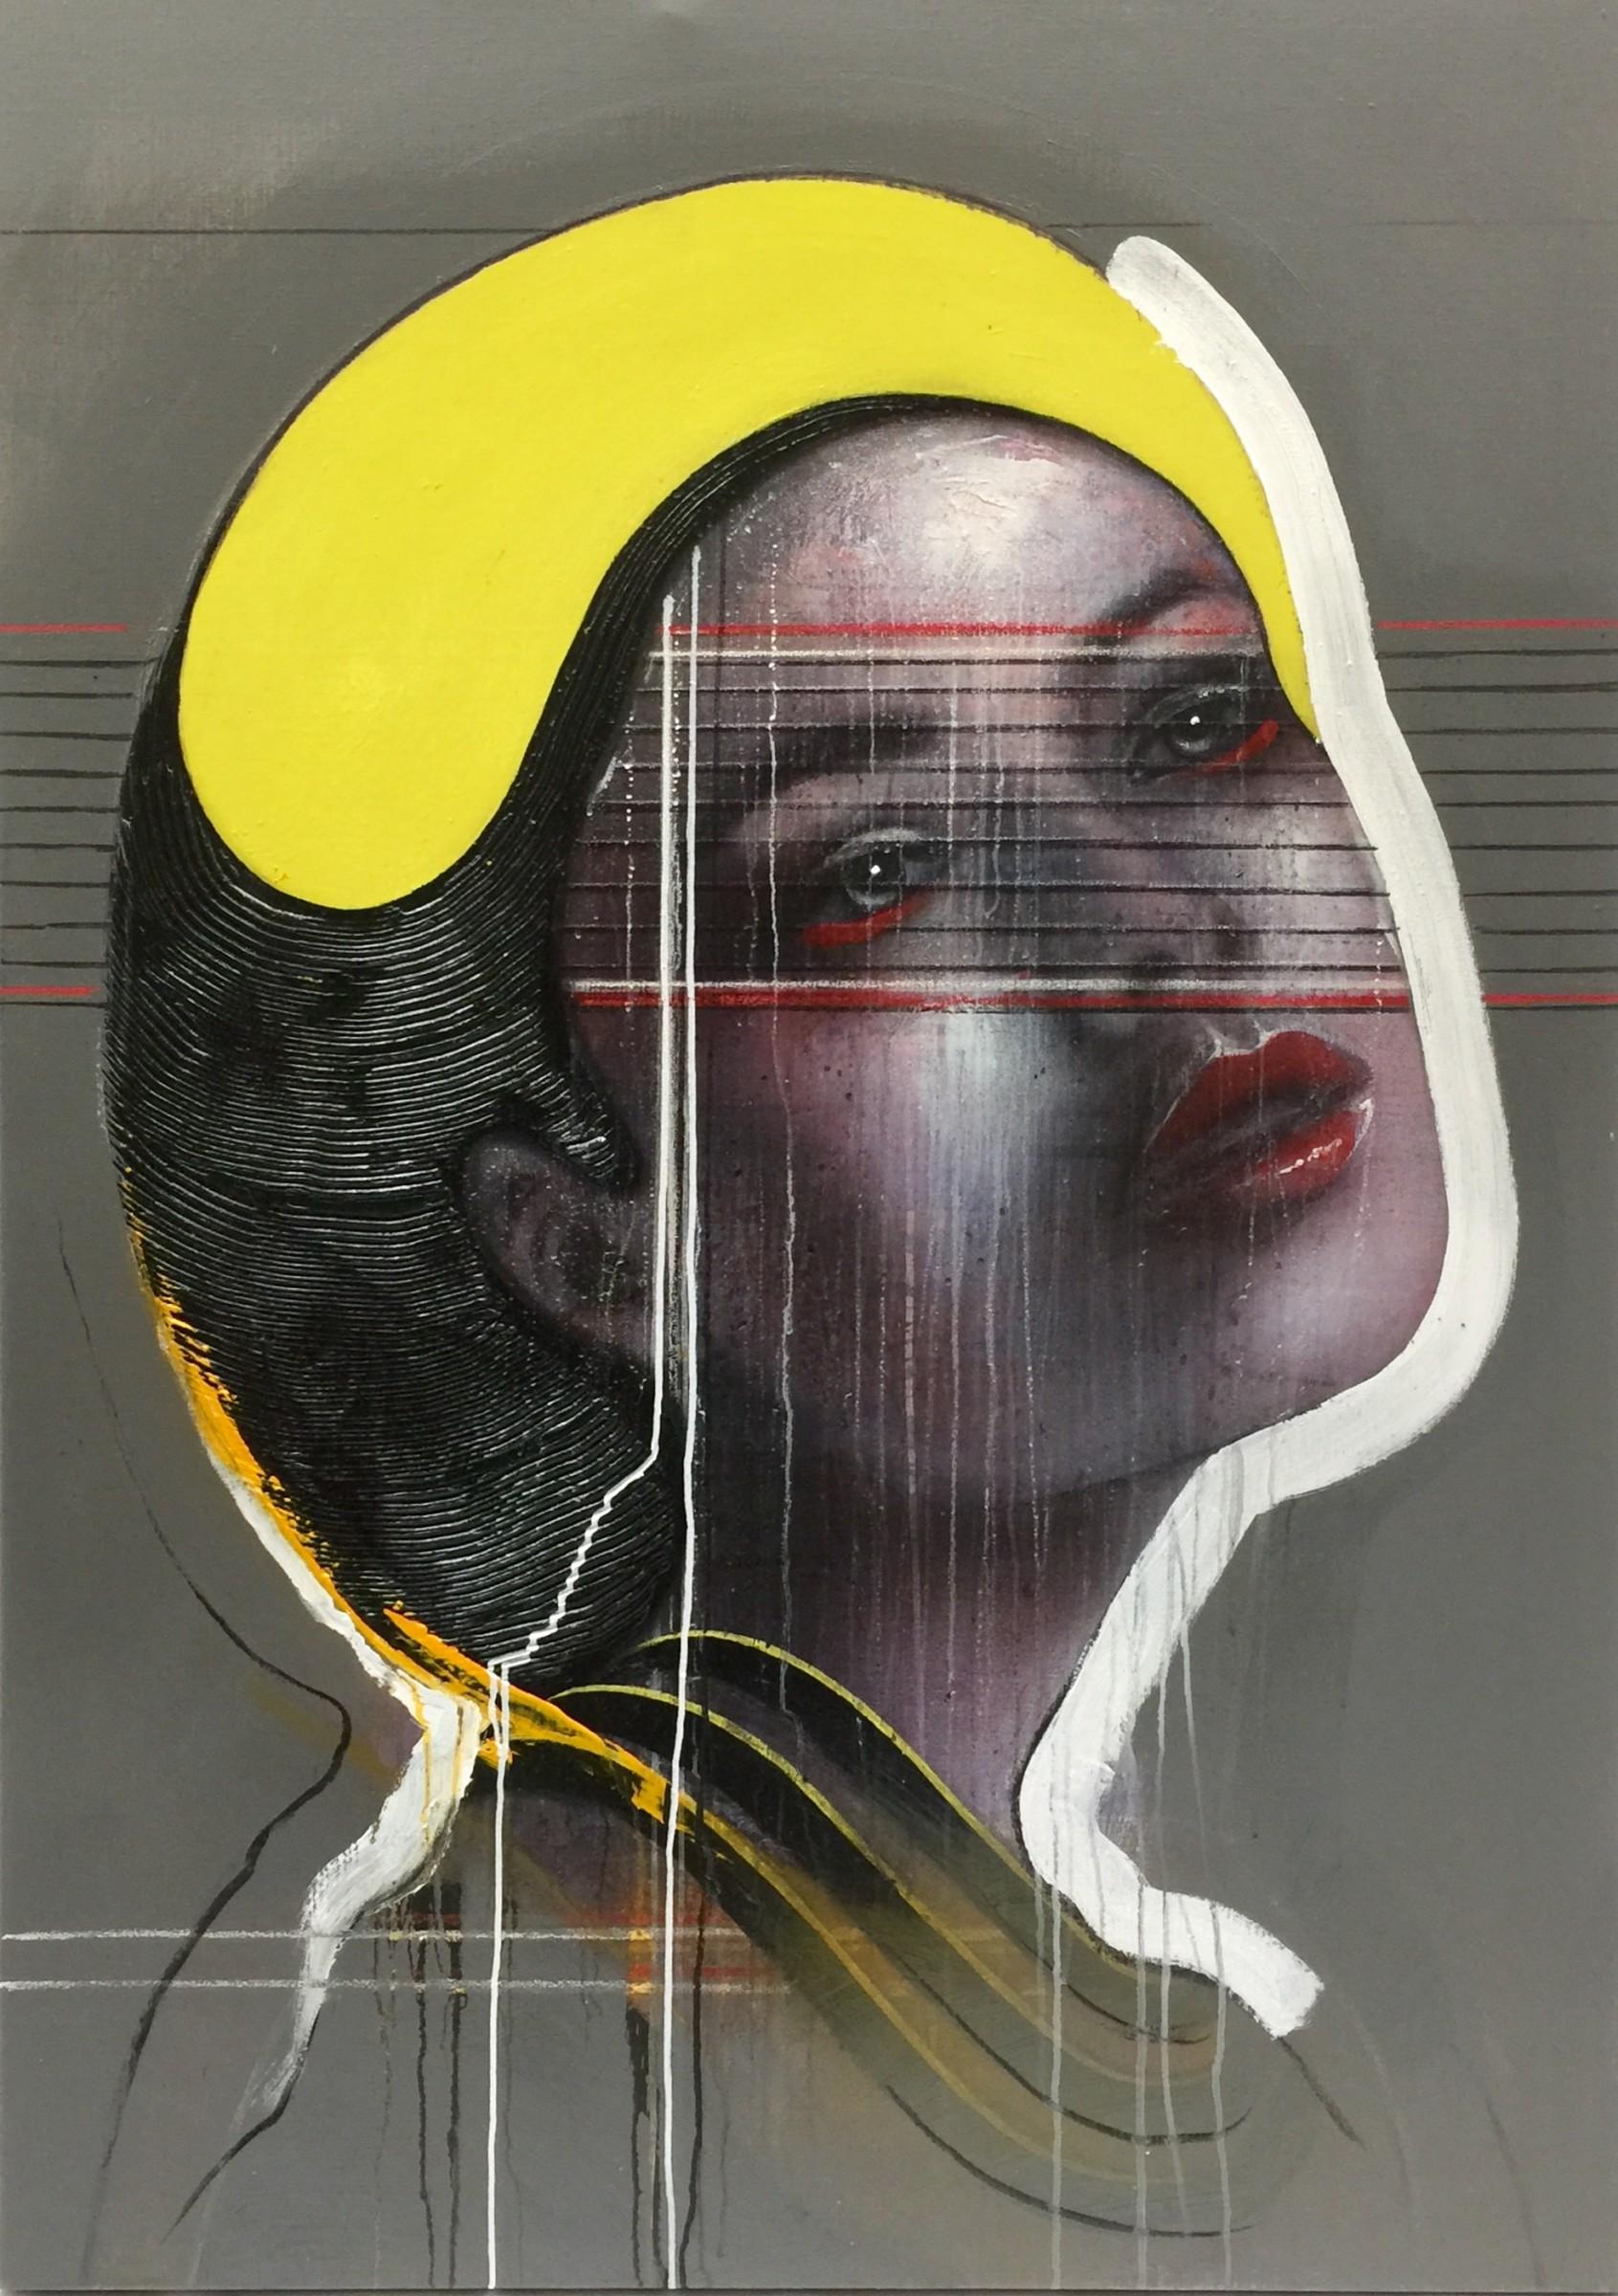 <span class=&#34;link fancybox-details-link&#34;><a href=&#34;/artists/40-ger-doornink/works/4206-ger-doornink-yellow-sun-2017/&#34;>View Detail Page</a></span><div class=&#34;artist&#34;><strong>Ger Doornink</strong></div> <div class=&#34;title&#34;><em>Yellow Sun</em>, 2017</div> <div class=&#34;medium&#34;>Oil on Canvas</div> <div class=&#34;dimensions&#34;>140 x 100 cm<br /> </div>